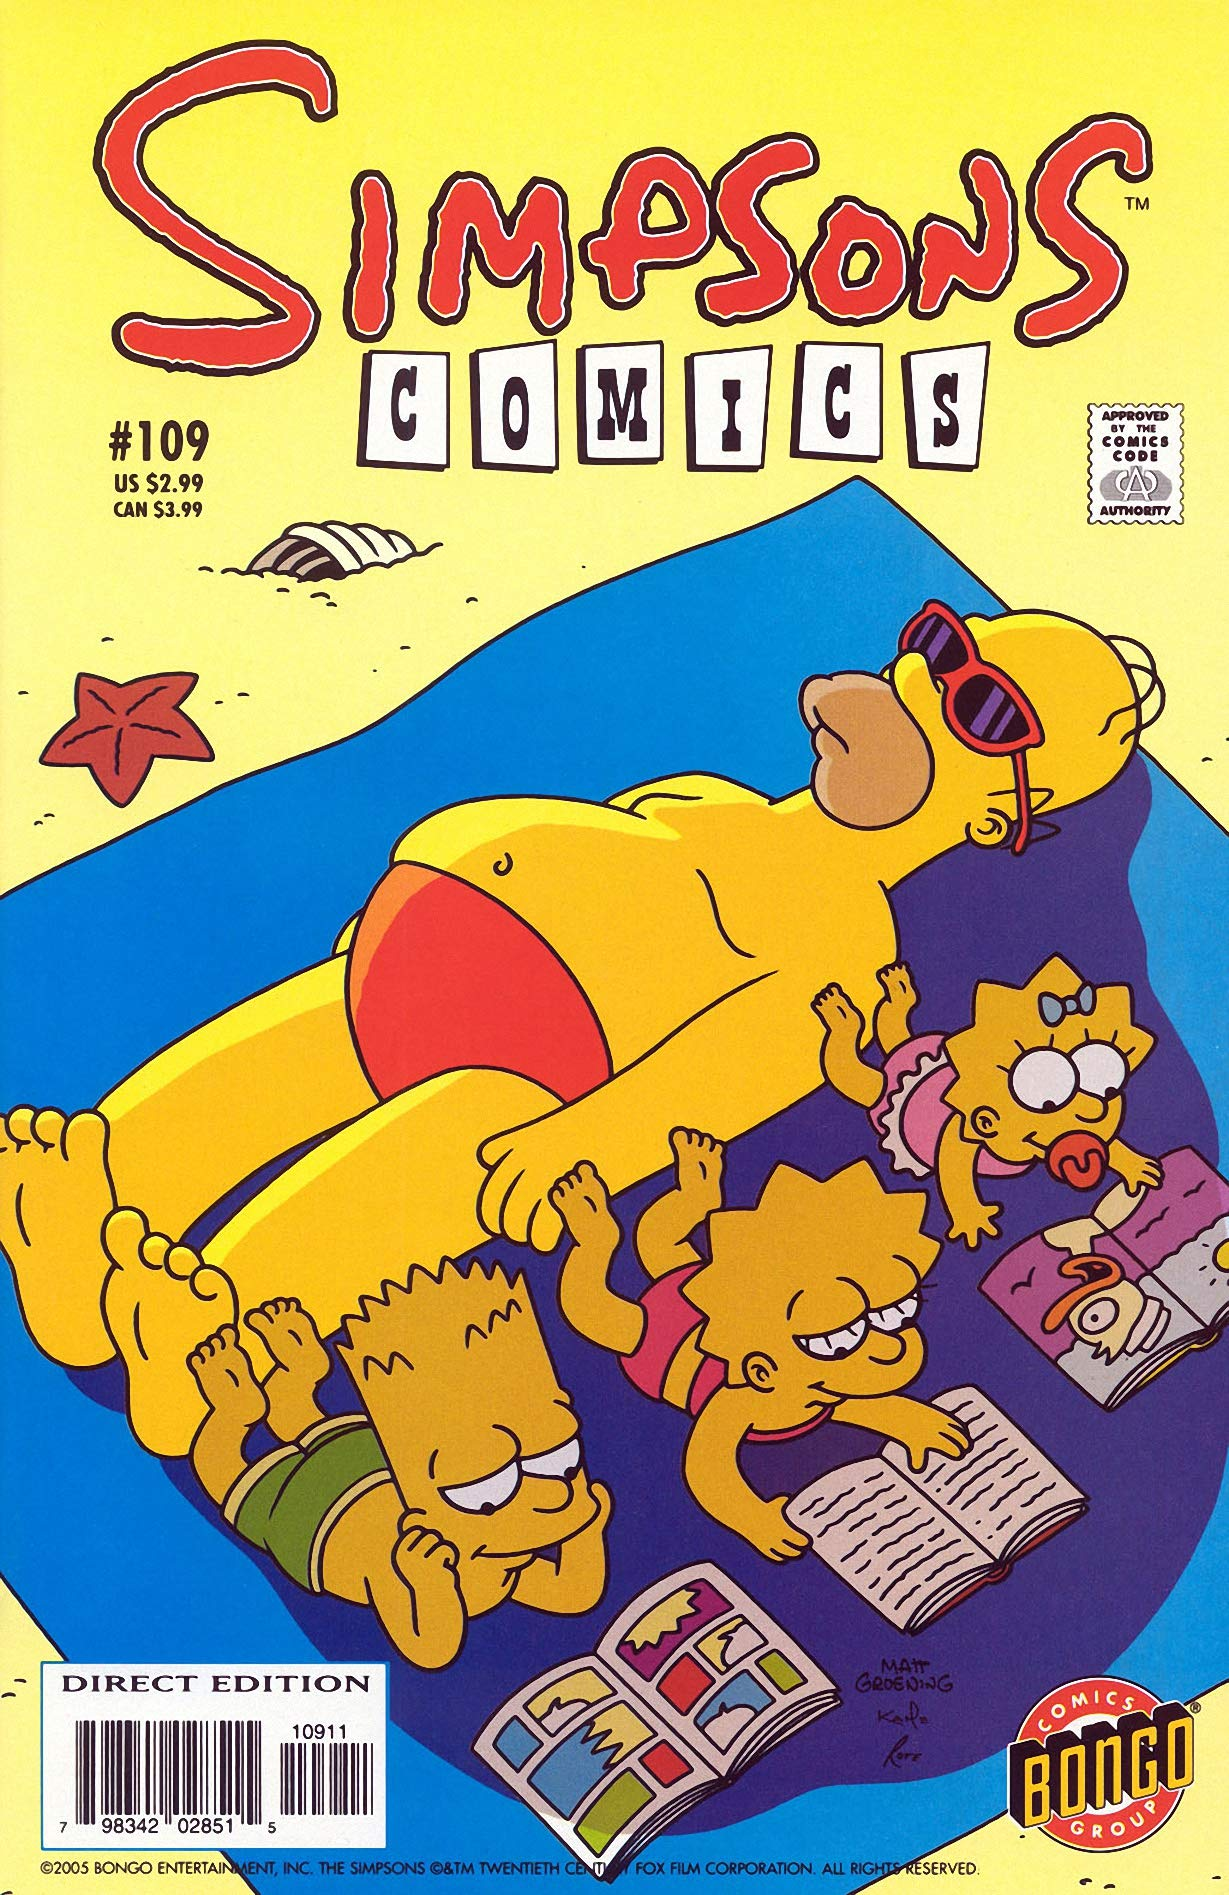 Simpsons Comics: Vol 19 Funny Cartoon Family Comics Books For Kids, Boys , Girls , Fans , Adults